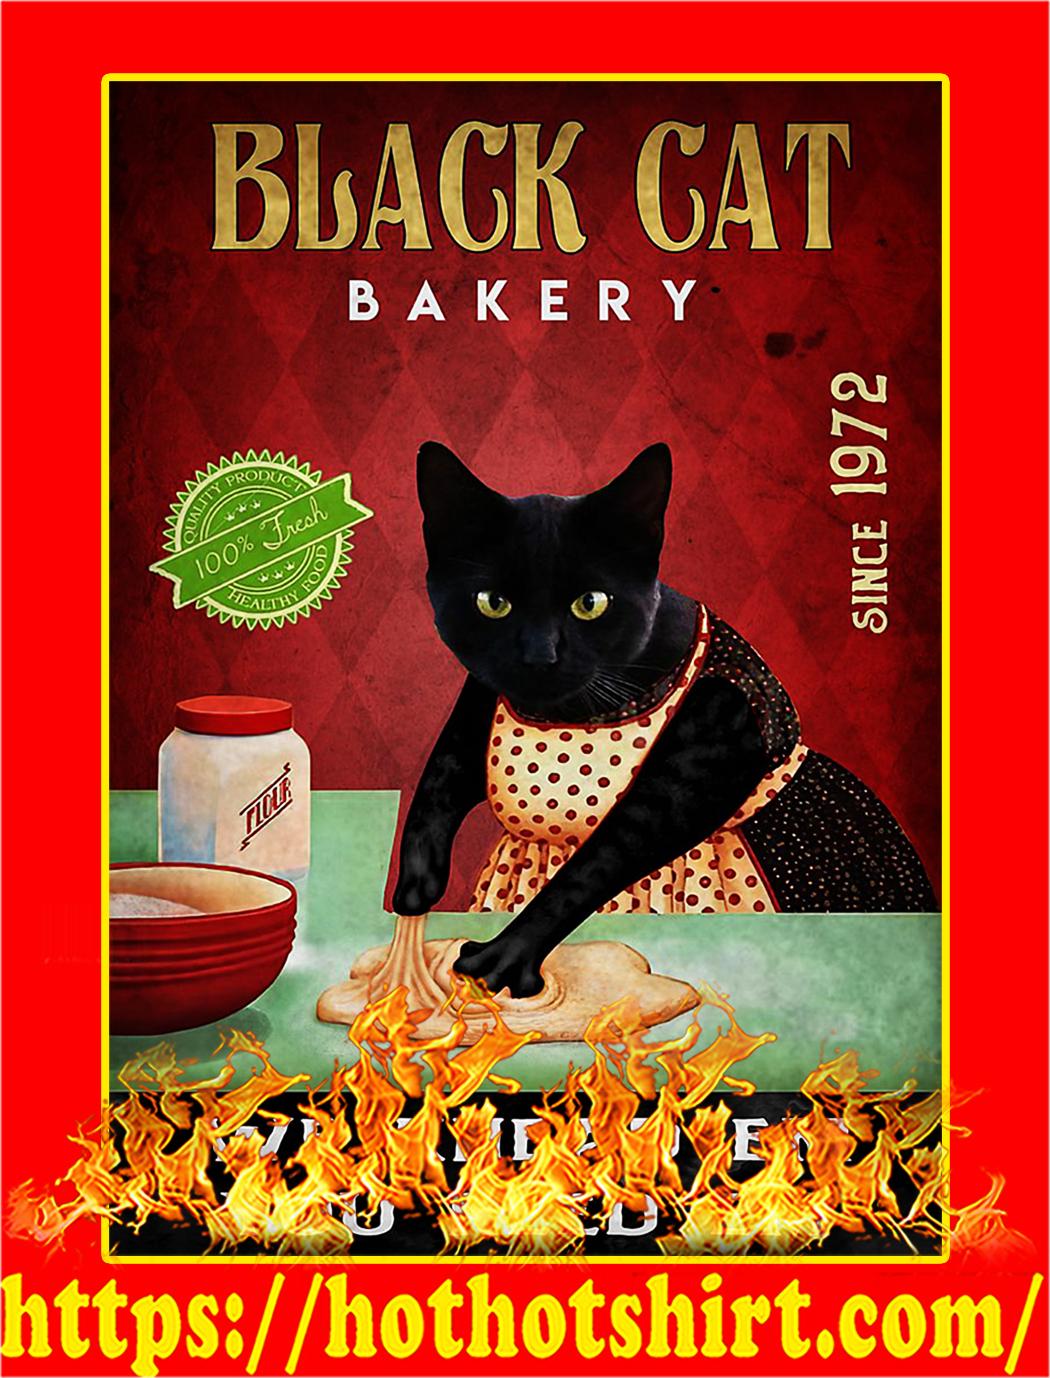 Black cat bakery we knead em you need em poster - A2